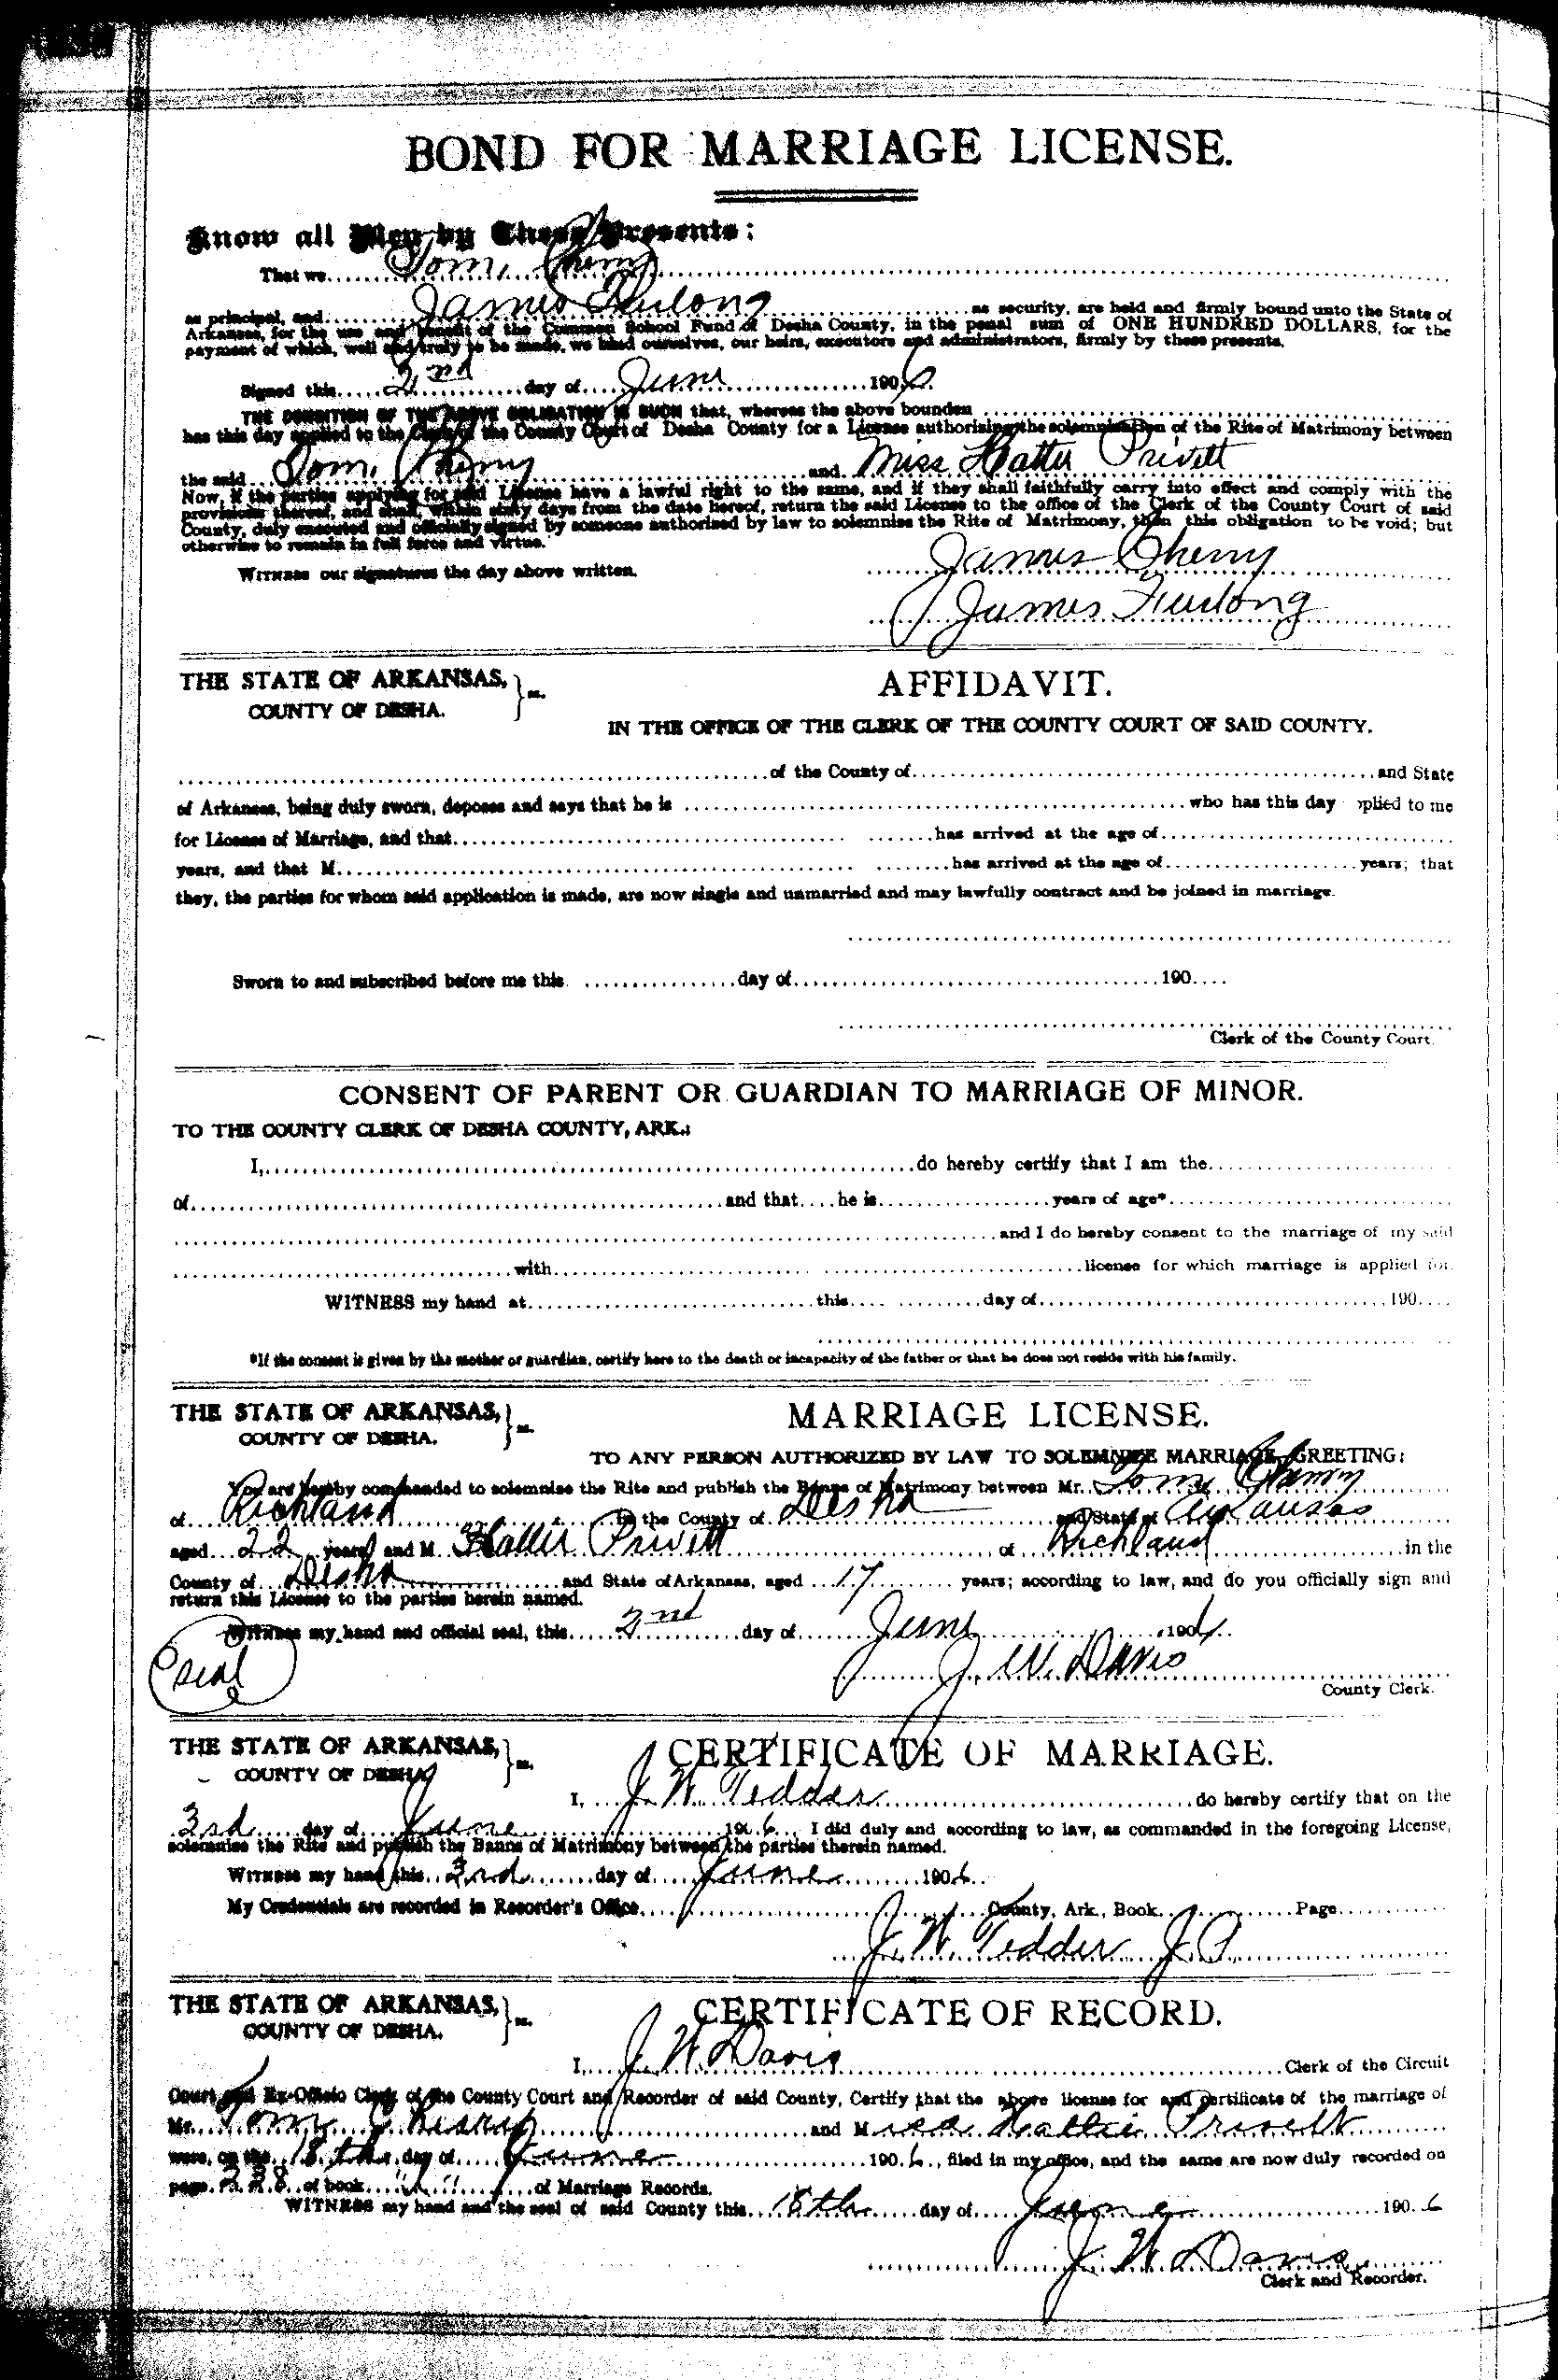 Privett family the privett family photo album a marriage licence in desha county lists hattie privett marrying tom cherry on 621906 xflitez Images